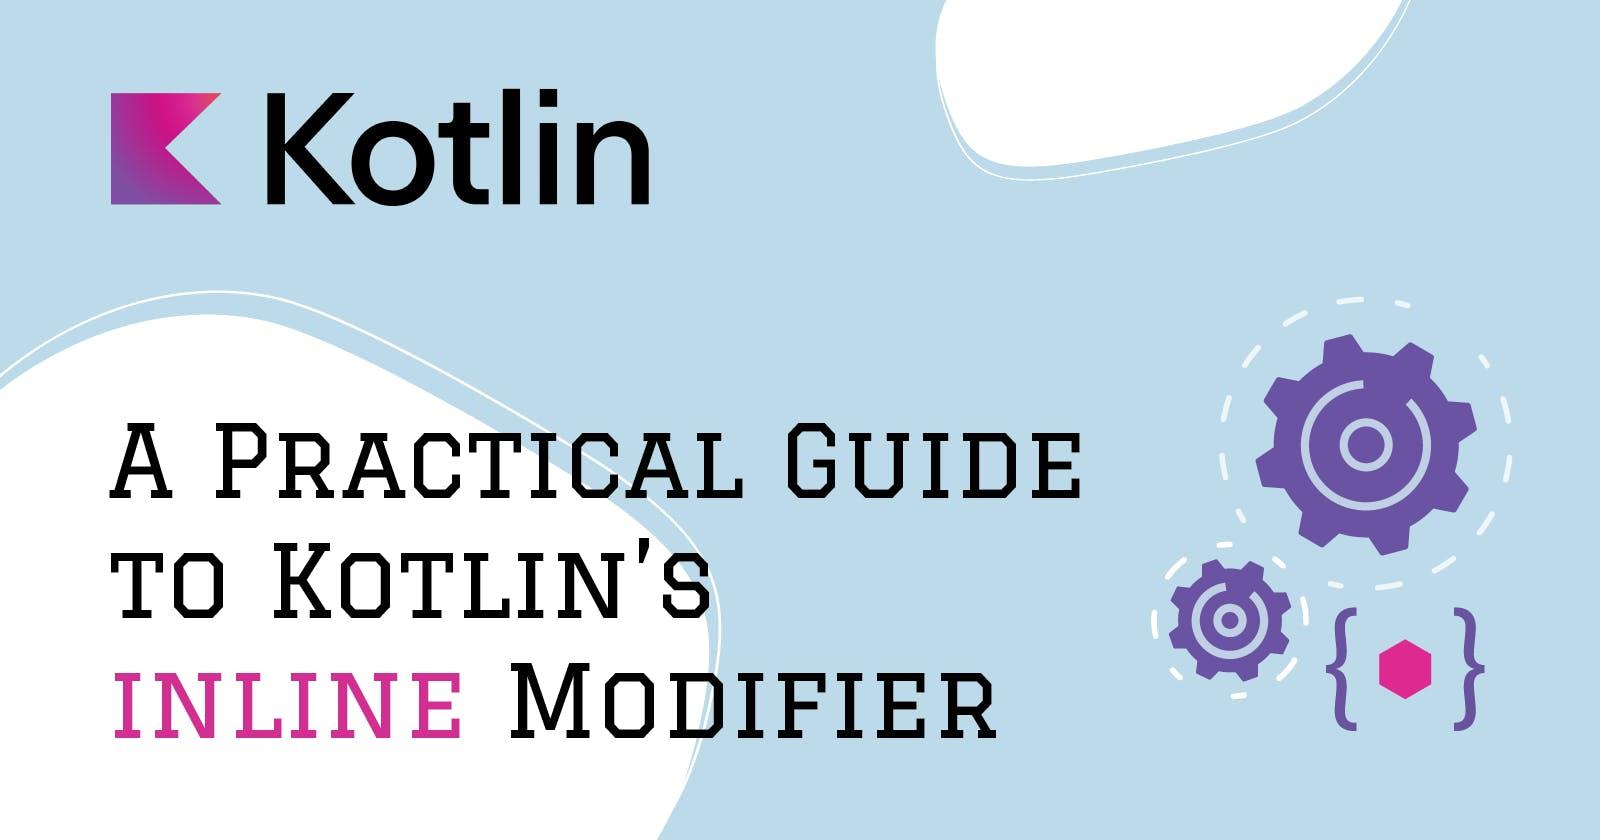 A Practical Guide to Kotlin's inline Modifier